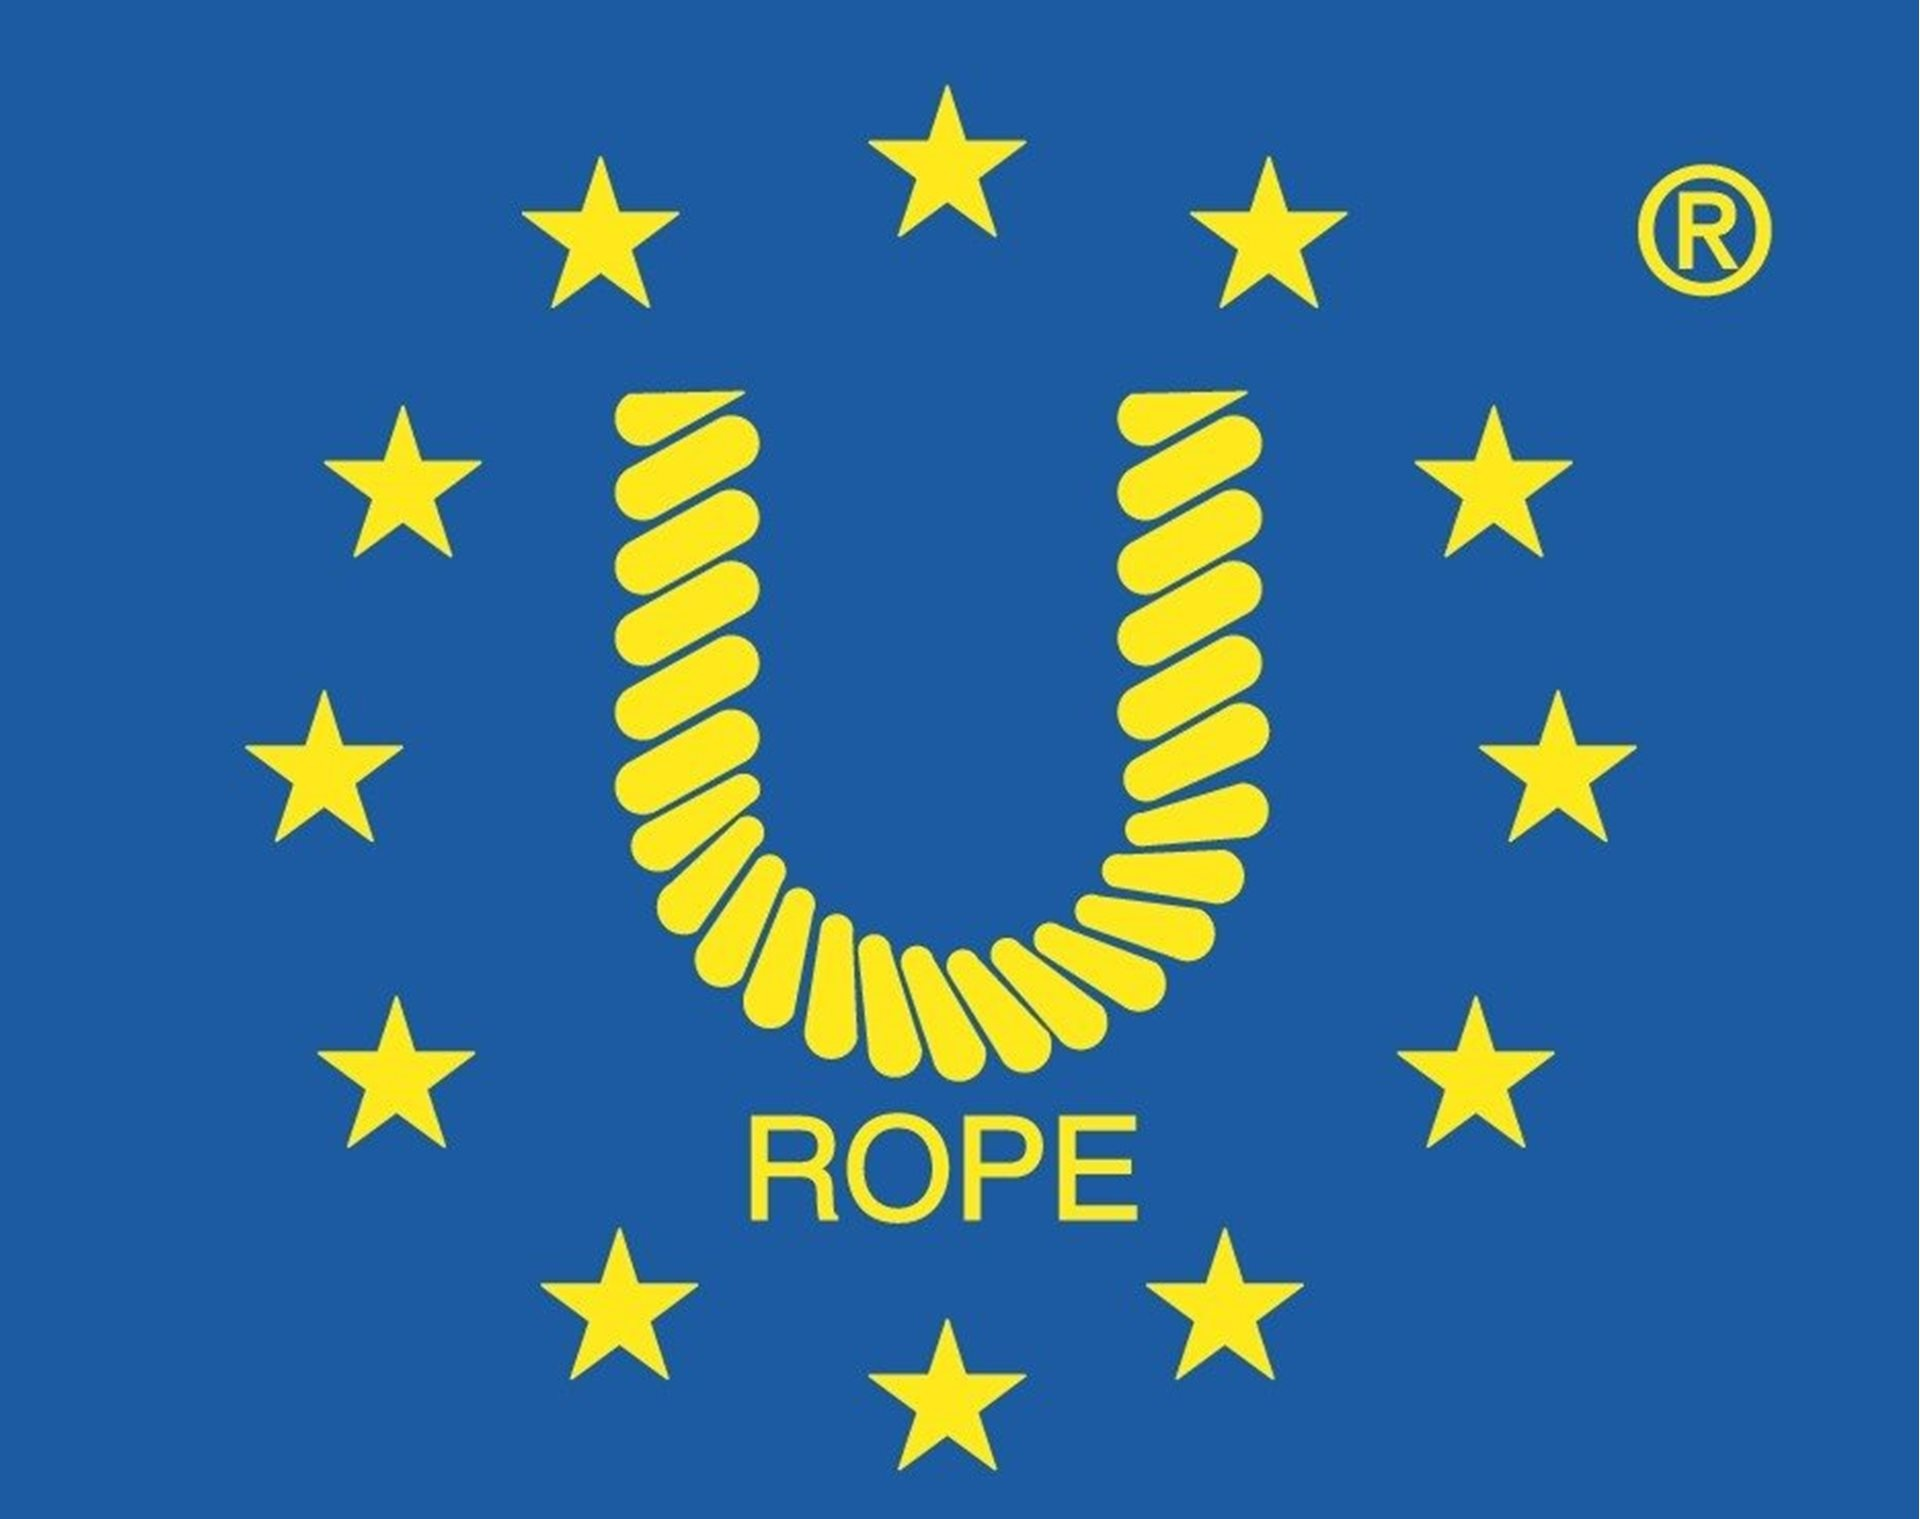 Logo U Rope